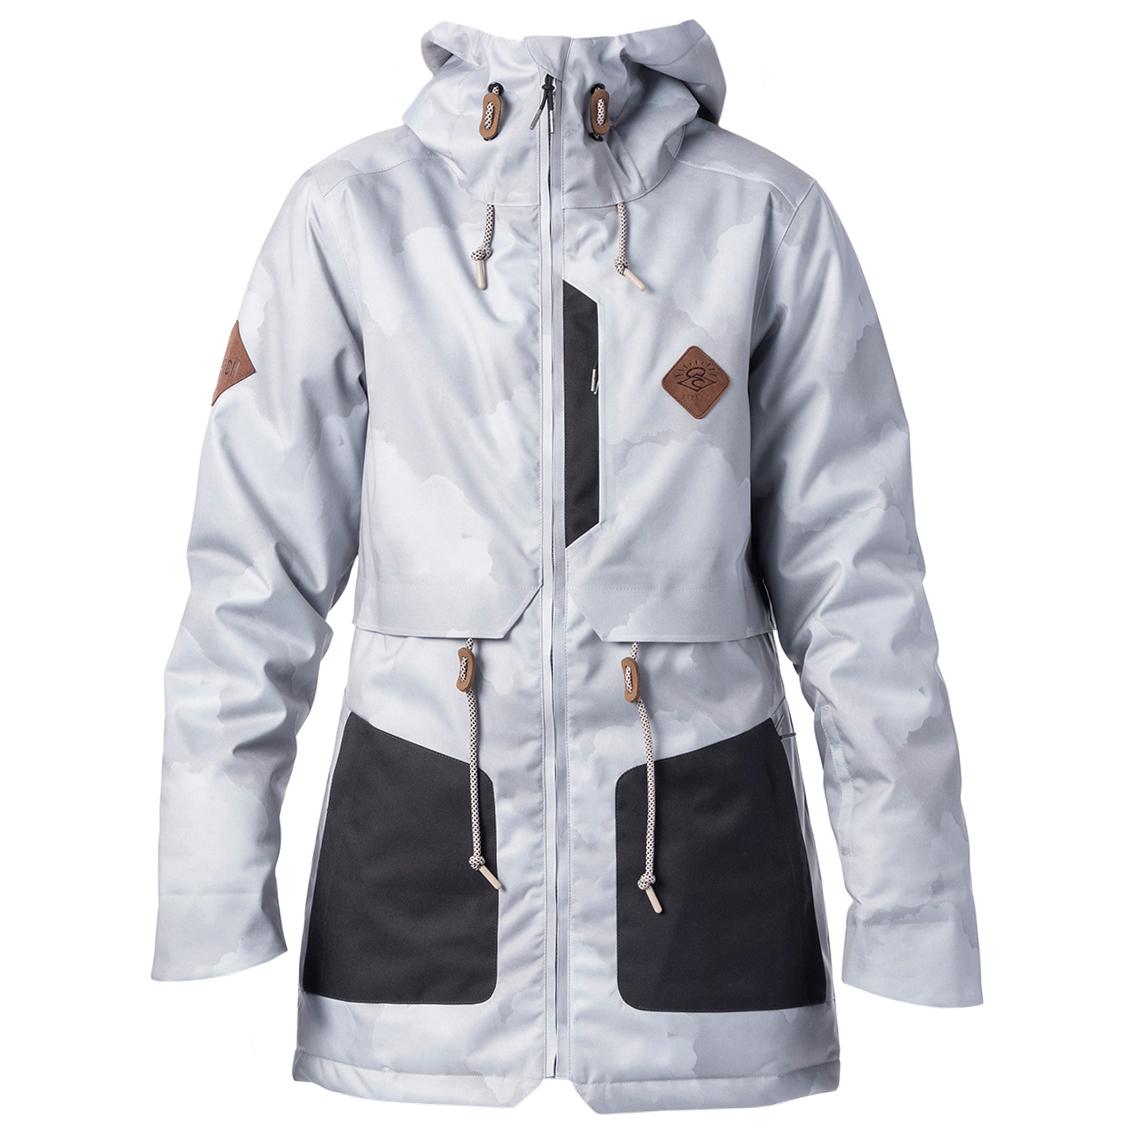 Rip Curl Amity Jacket - Veste de ski Femme